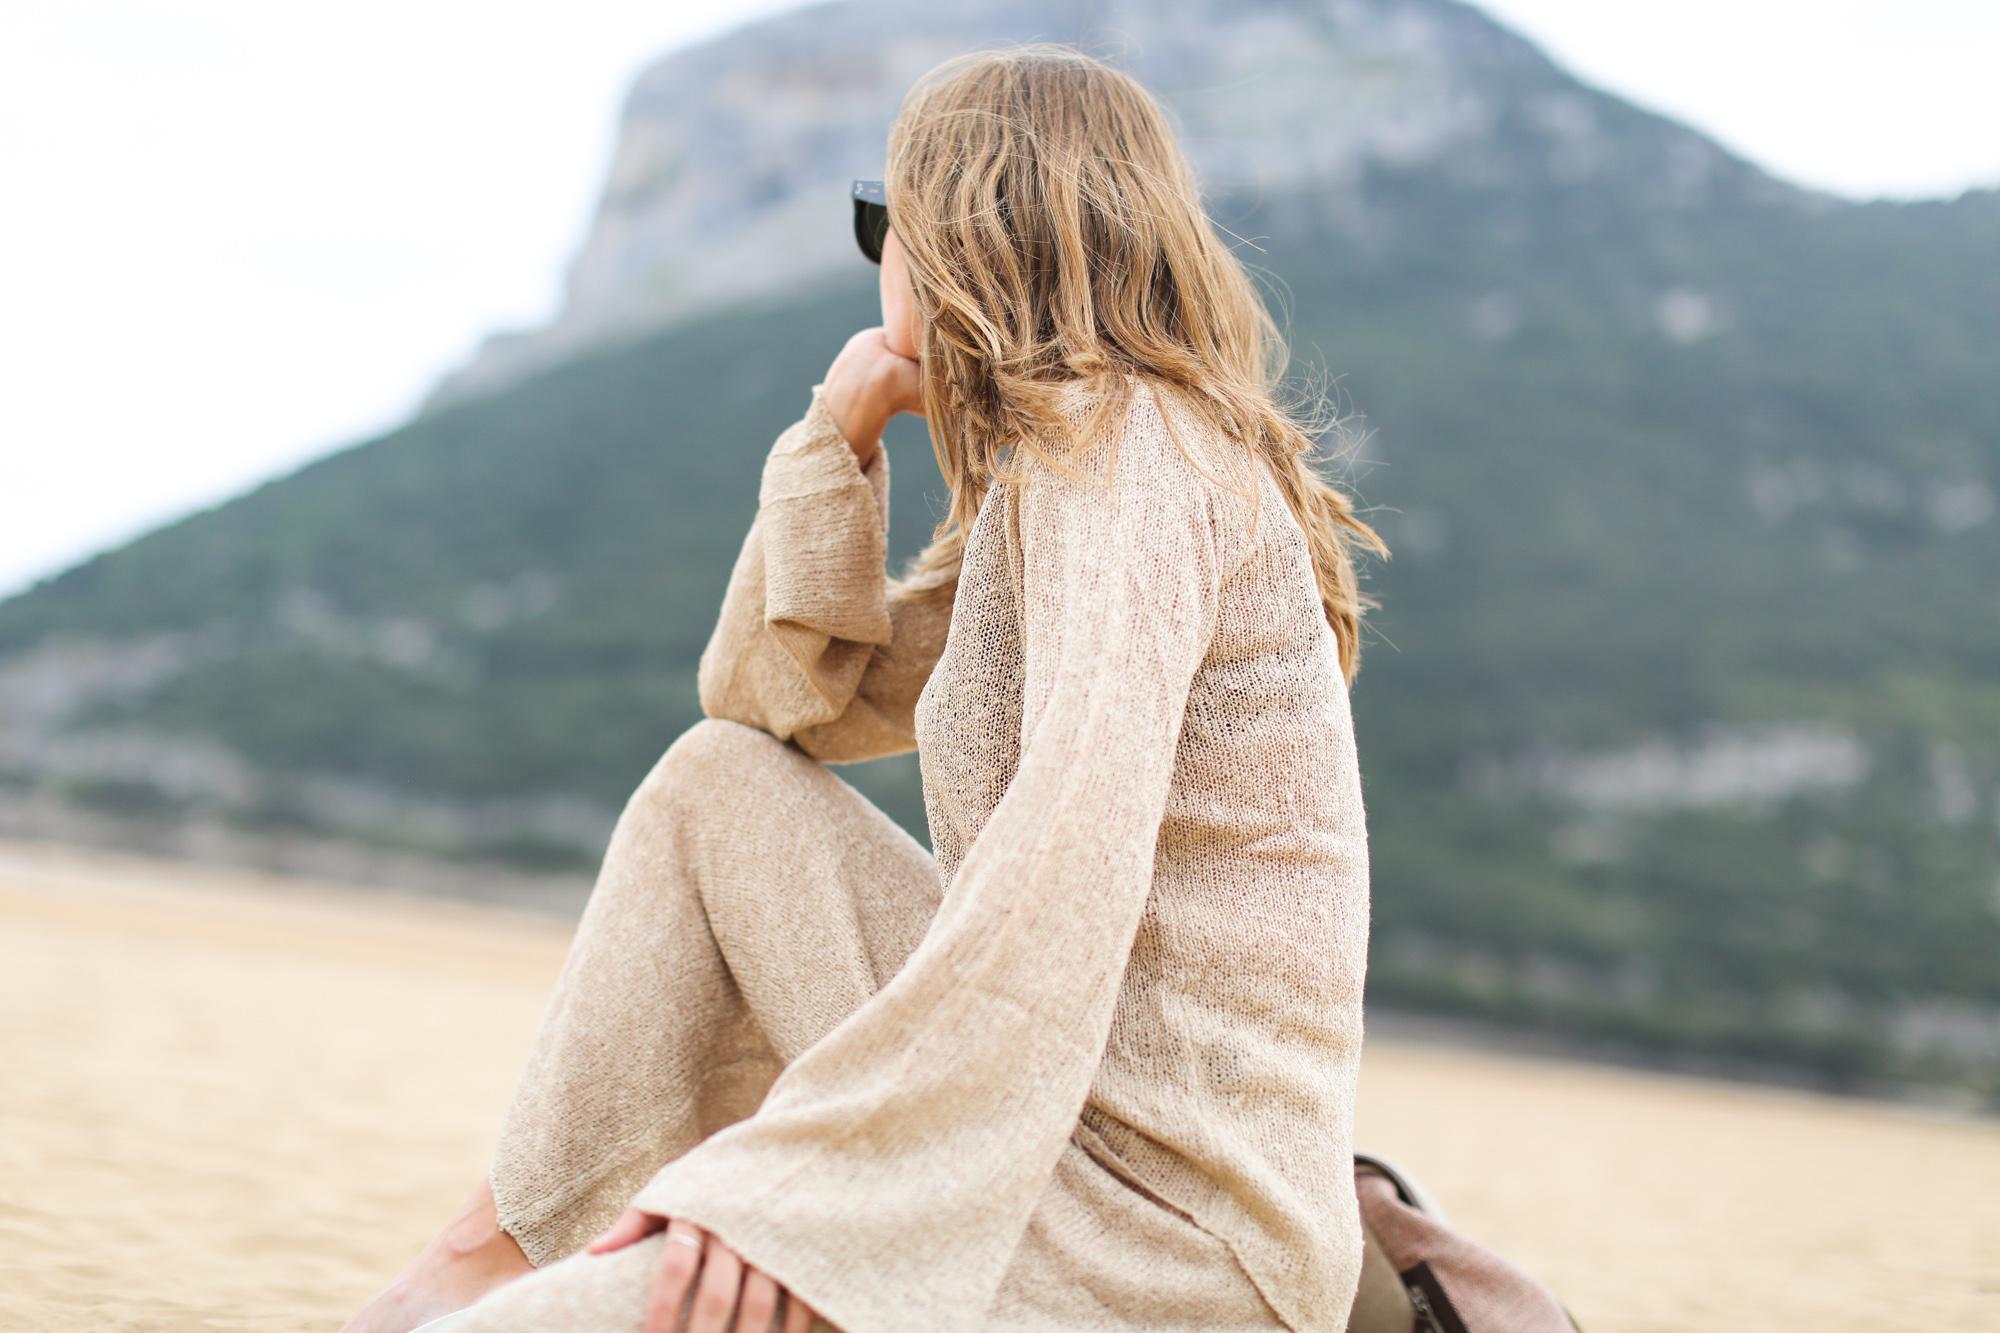 Clochet_pantalon_culotte_Zara_punto_verano-6